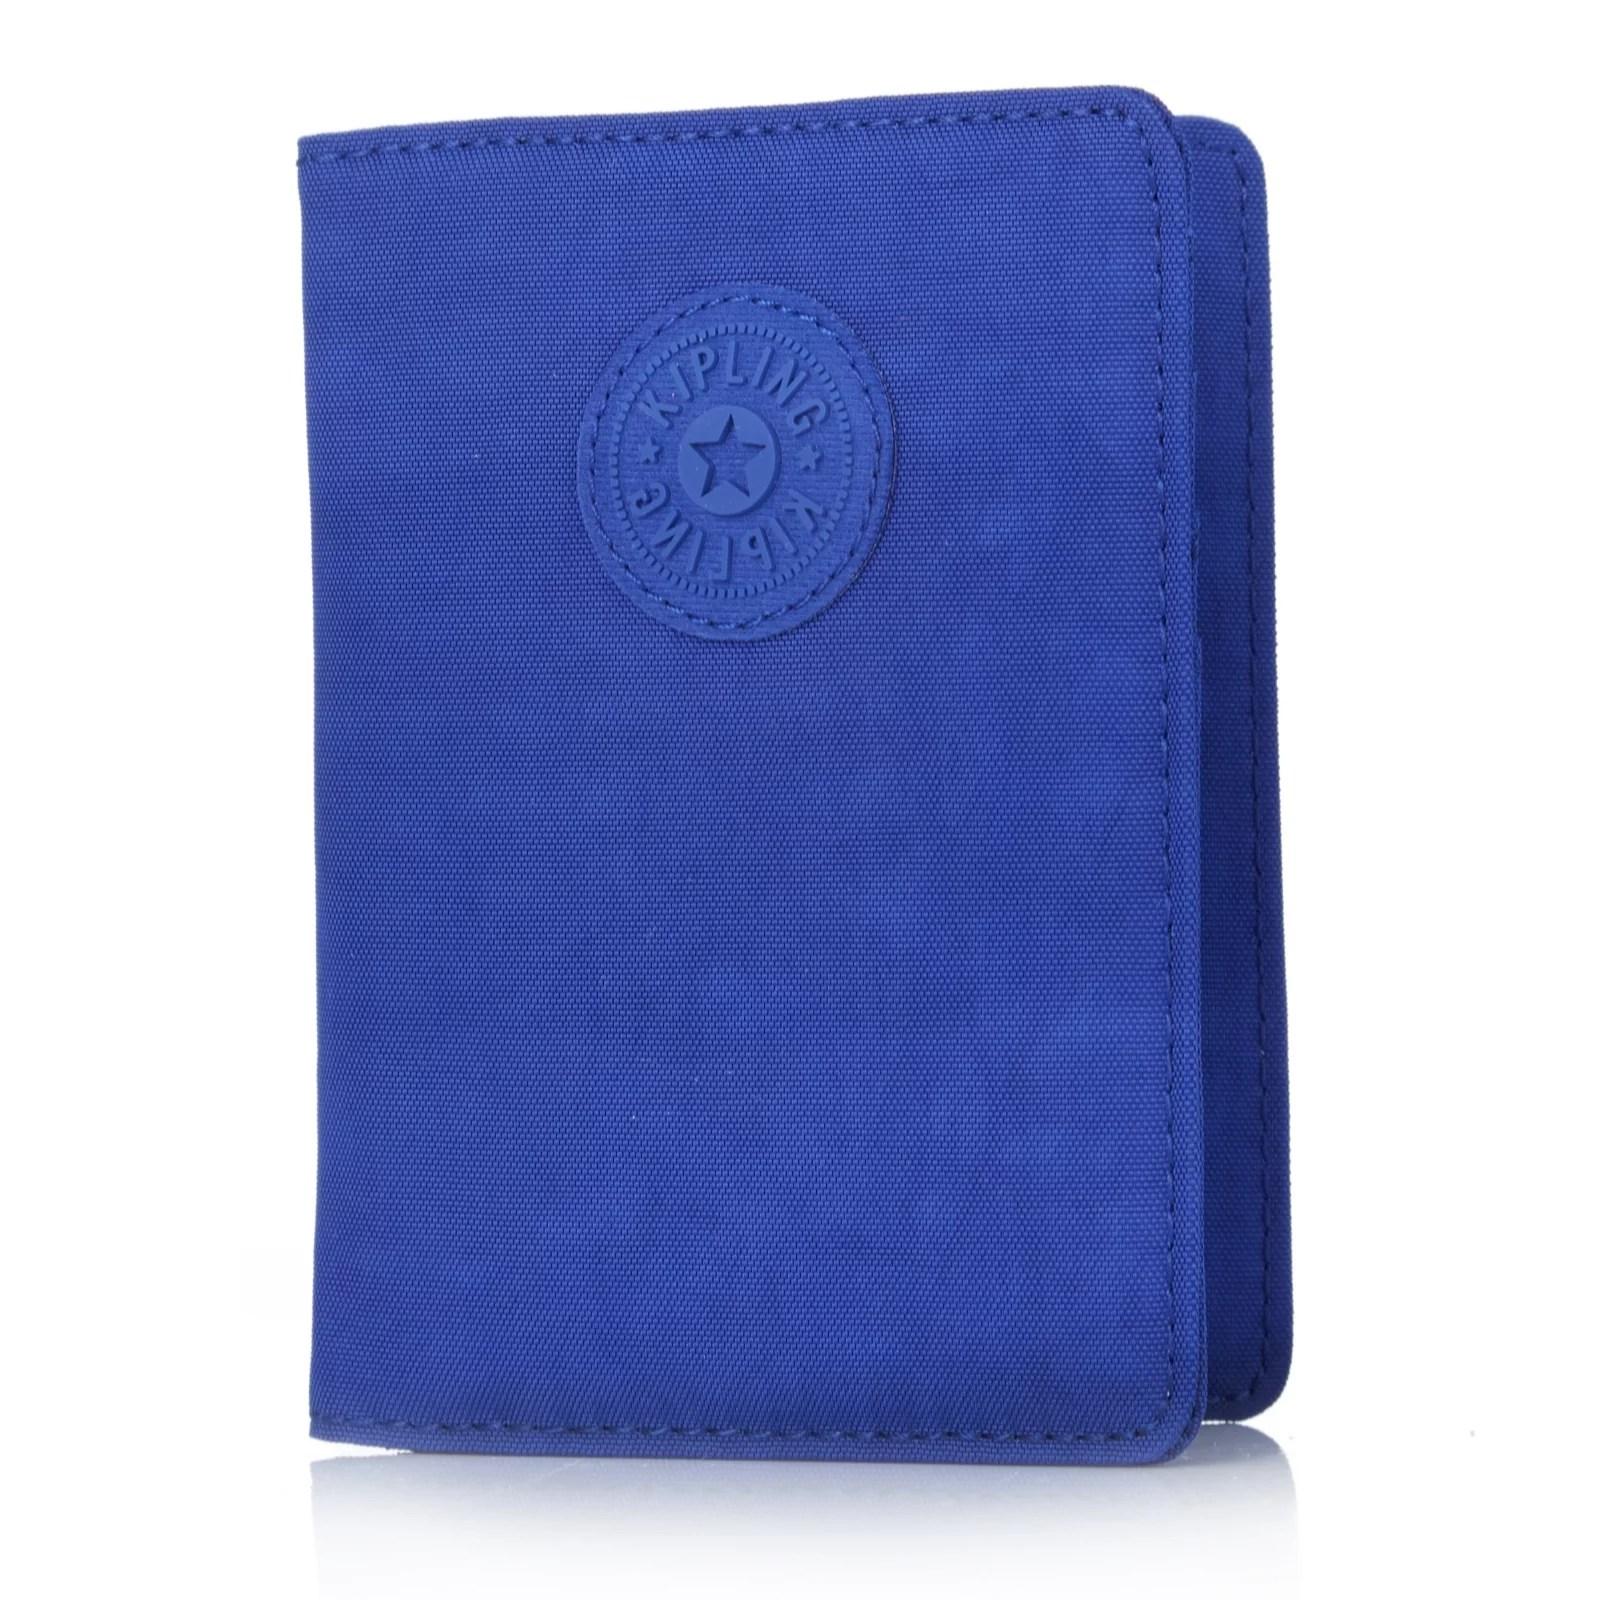 Kipling Passport Holder QVC UK